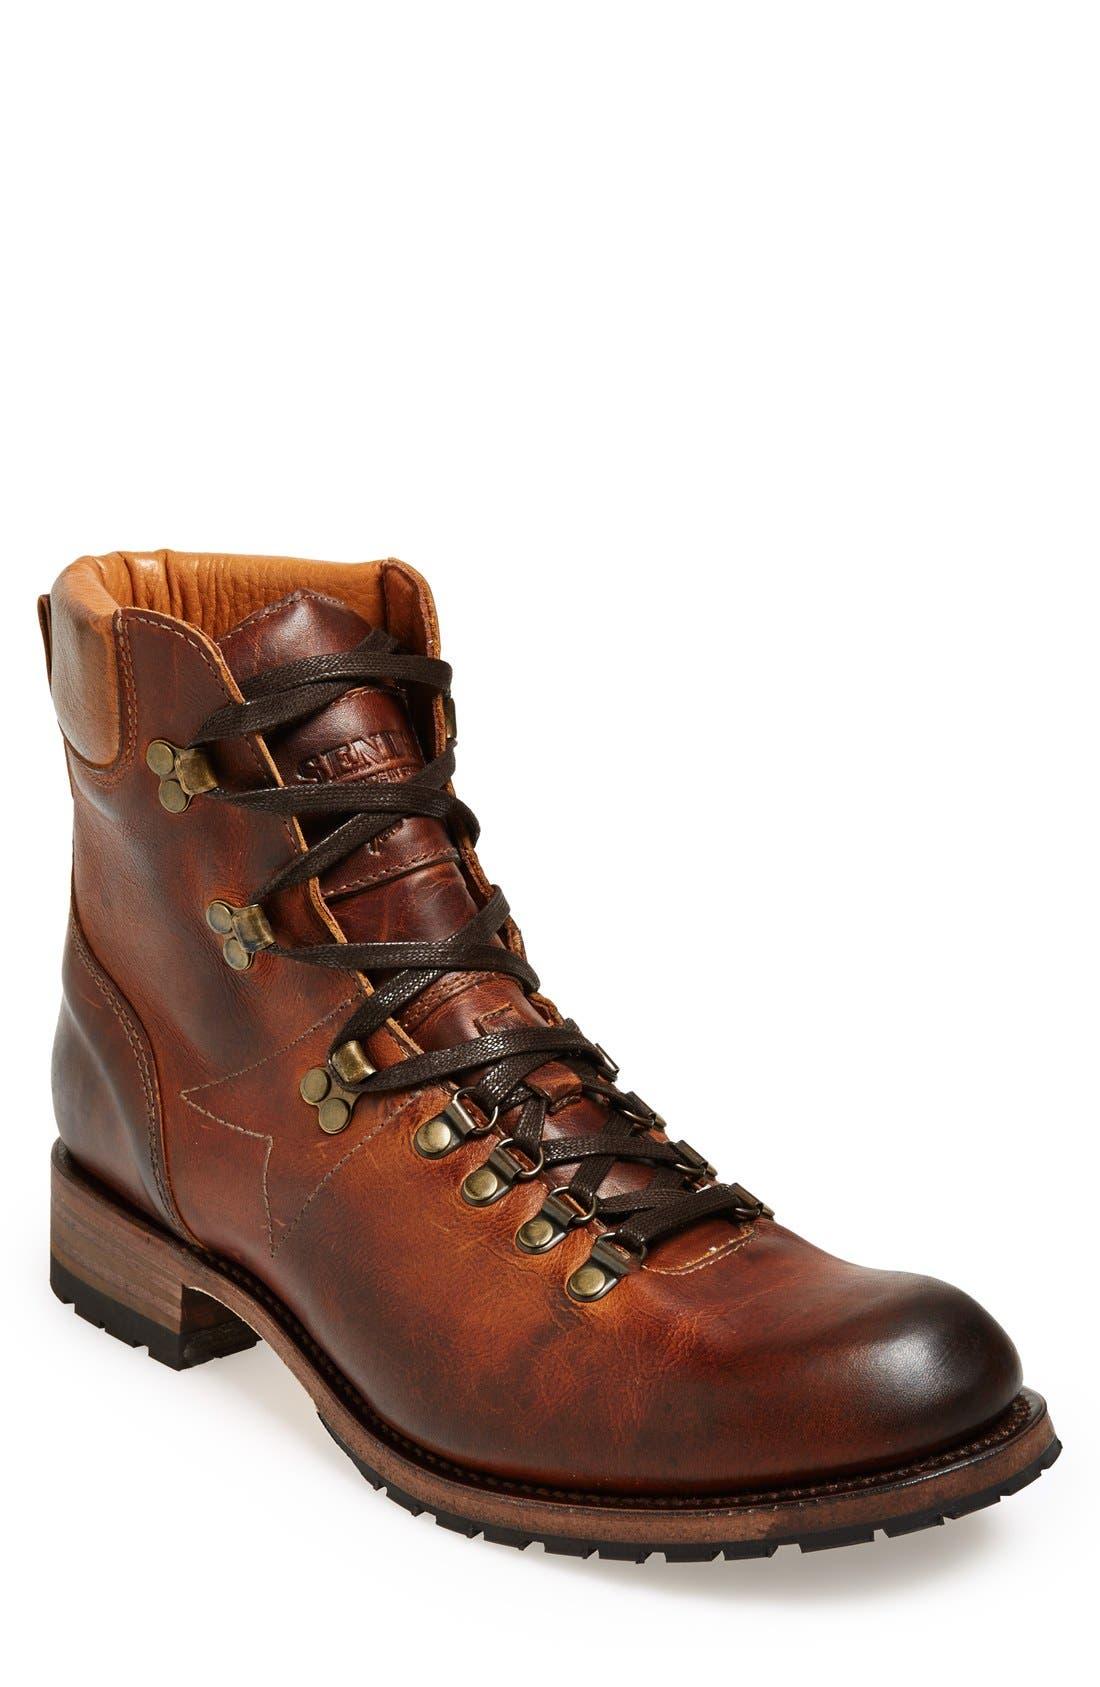 Alternate Image 1 Selected - Sendra 'Alpine' Round Toe Boot (Men)